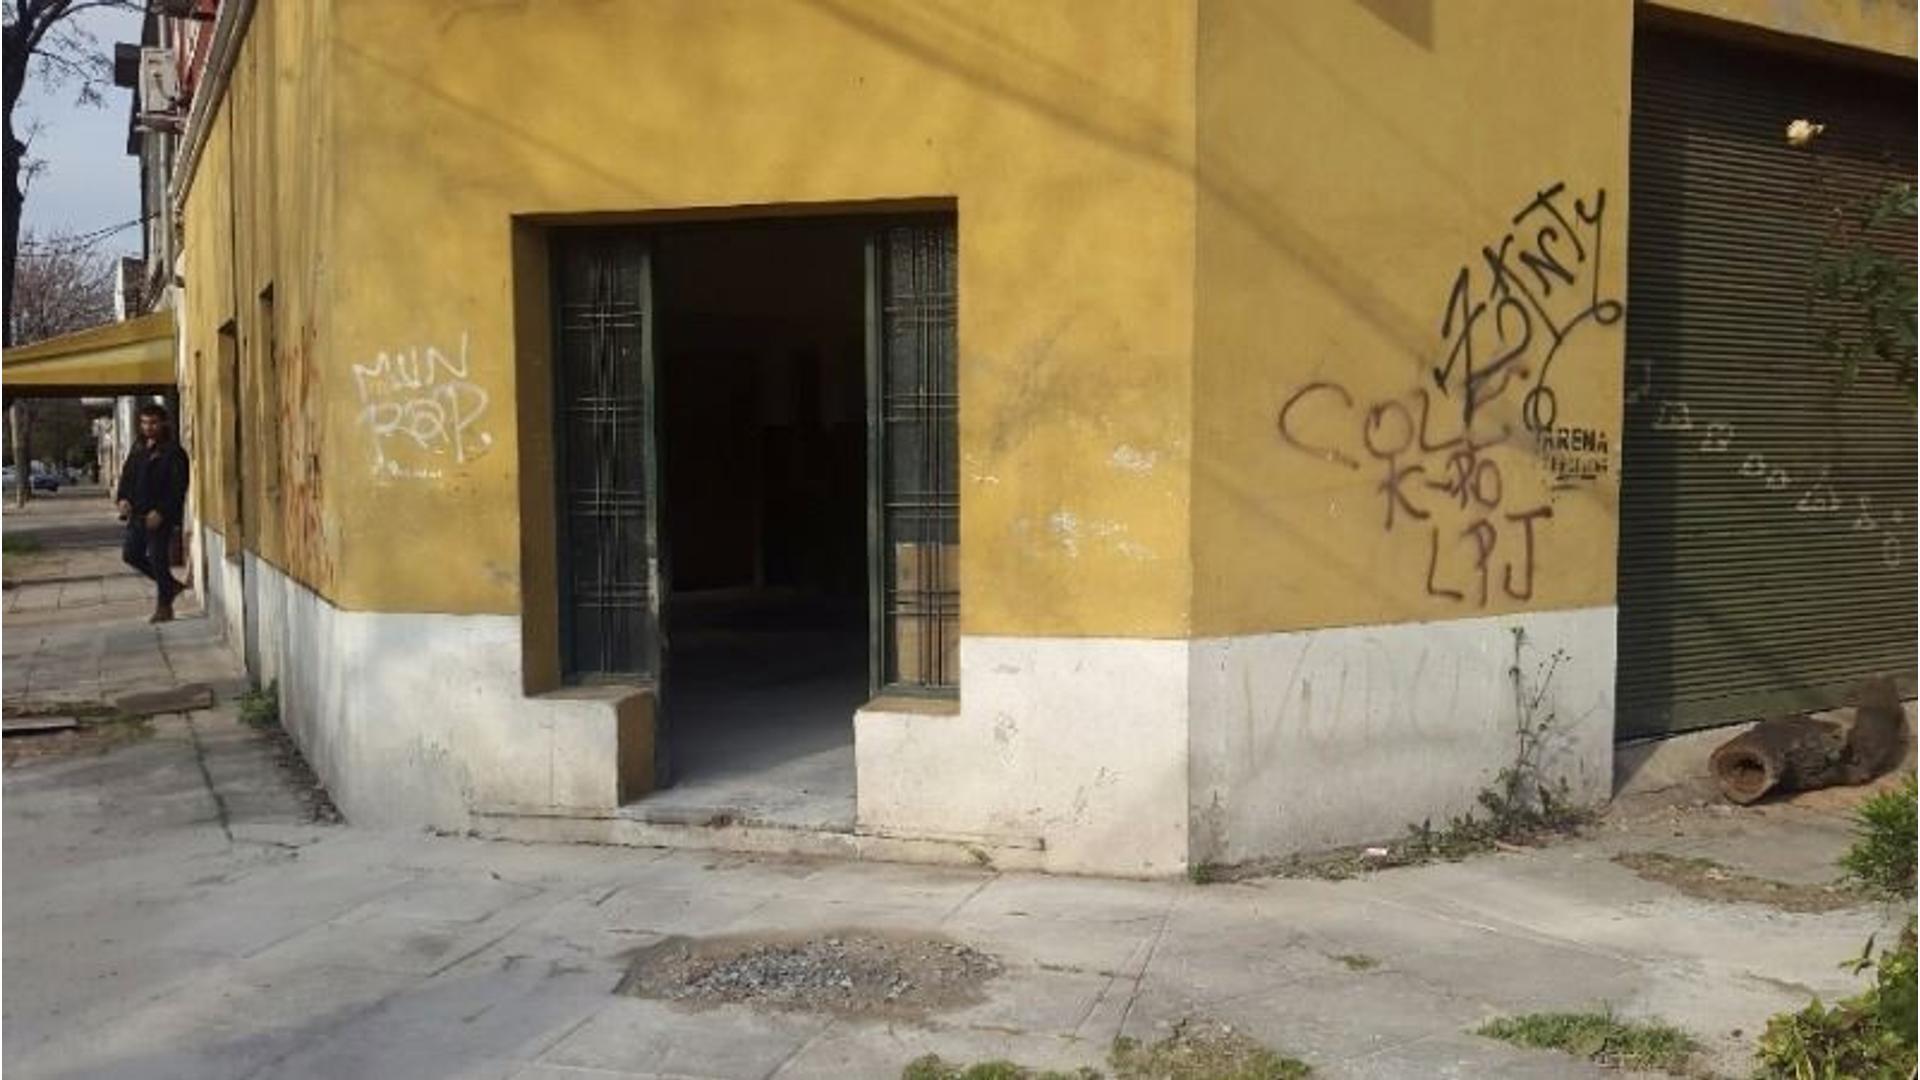 PH DE APROX 90 EN ESQUINA, UTILIZADO ACTUALMENTE COMO DEPOSITO